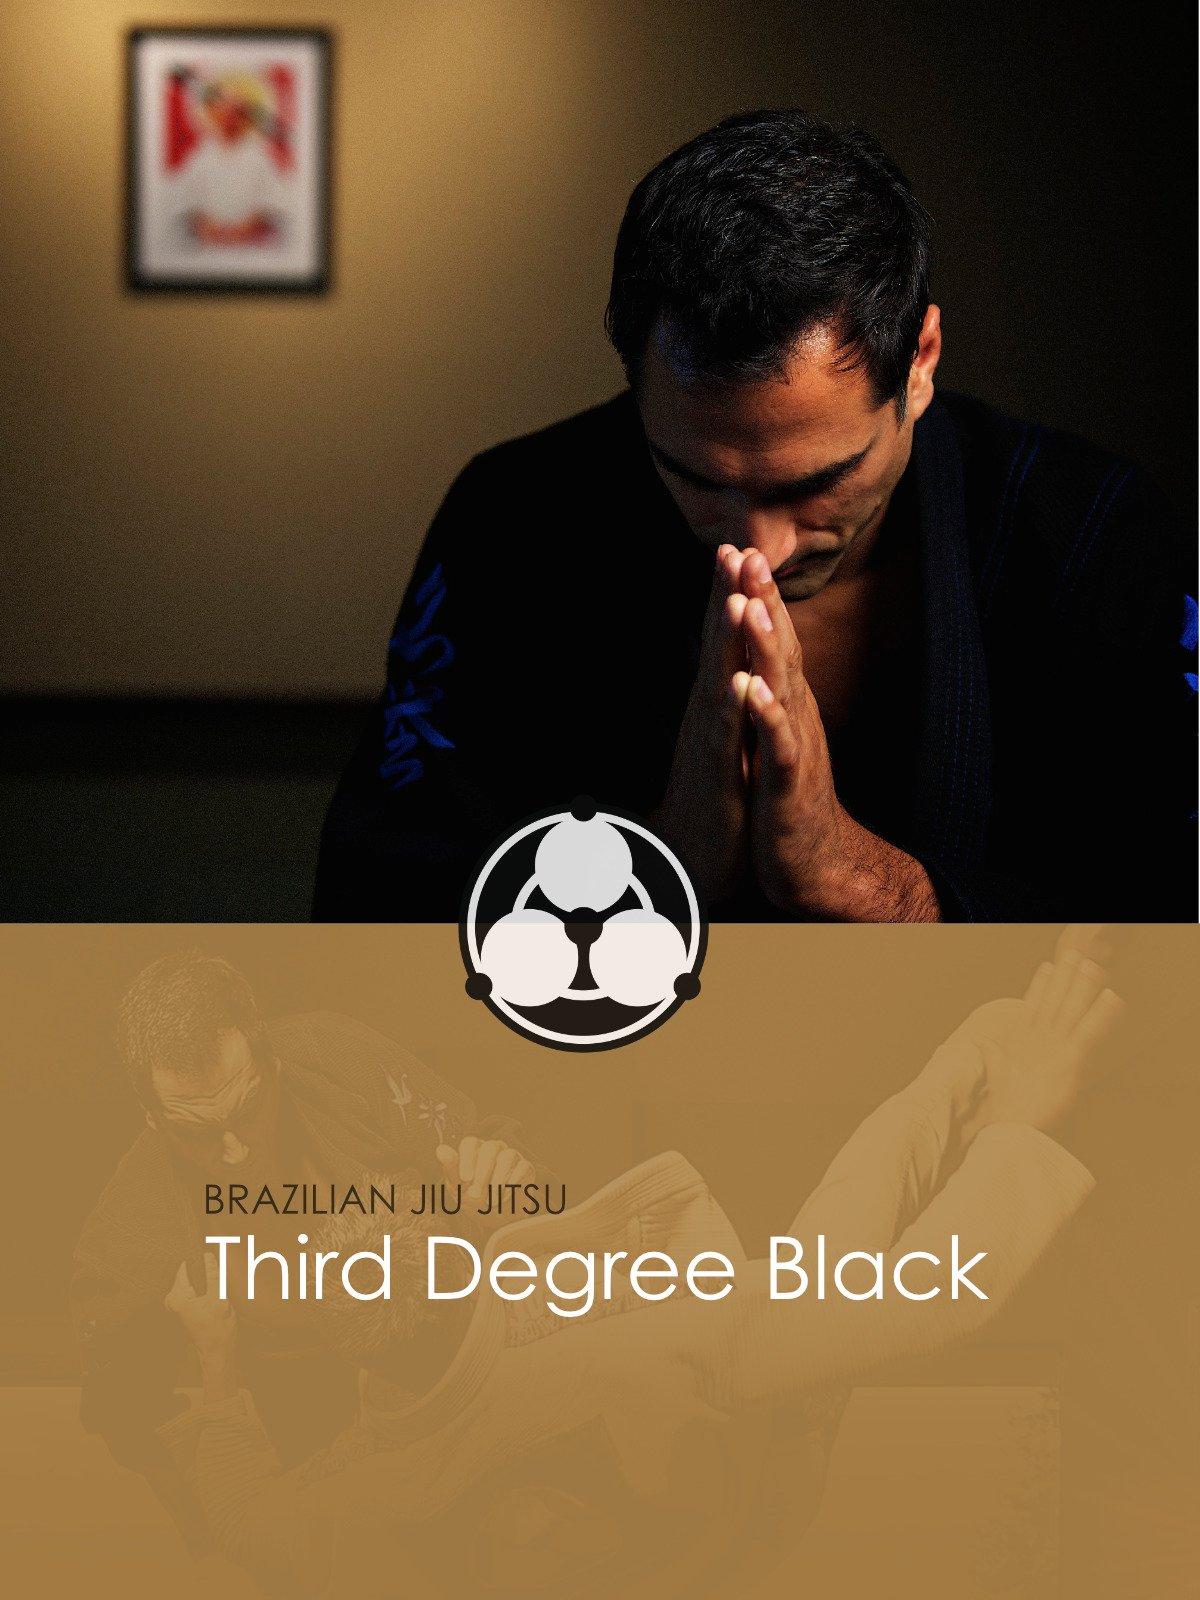 Brazilian Jiu Jitsu: Third Degree Black